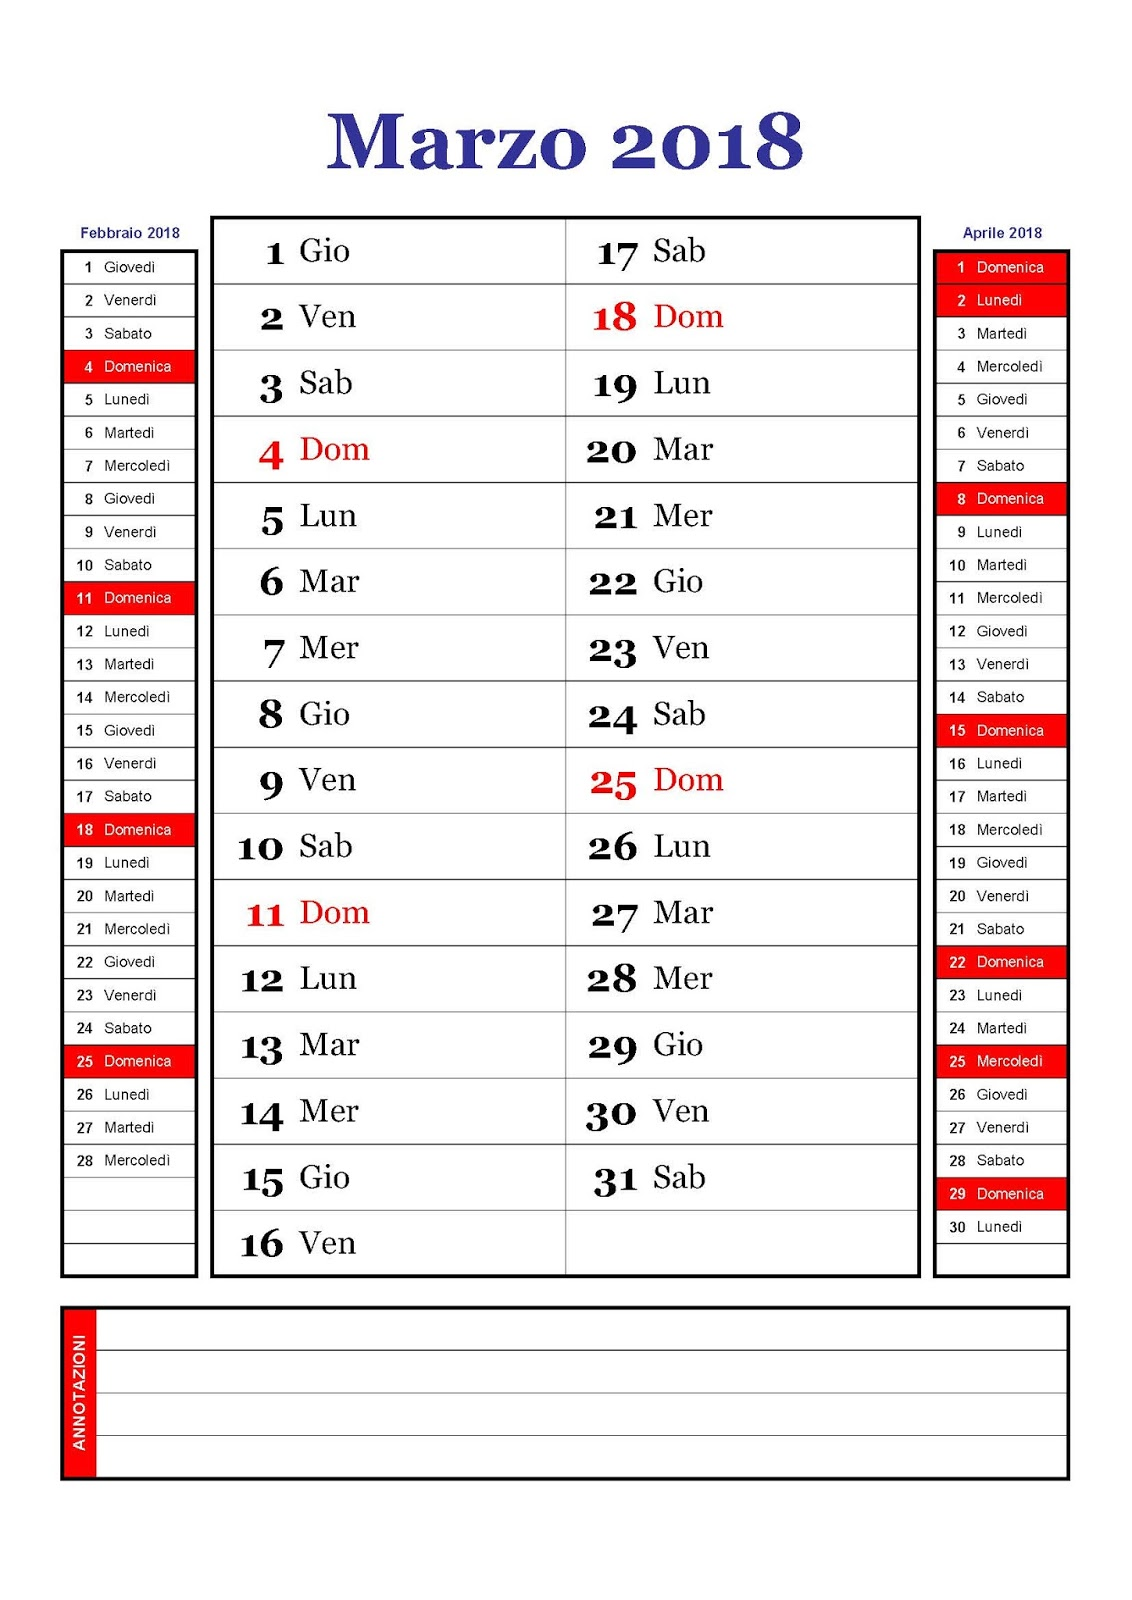 Marzo Calendario.Calendario Calendario Mensile Marzo 2018